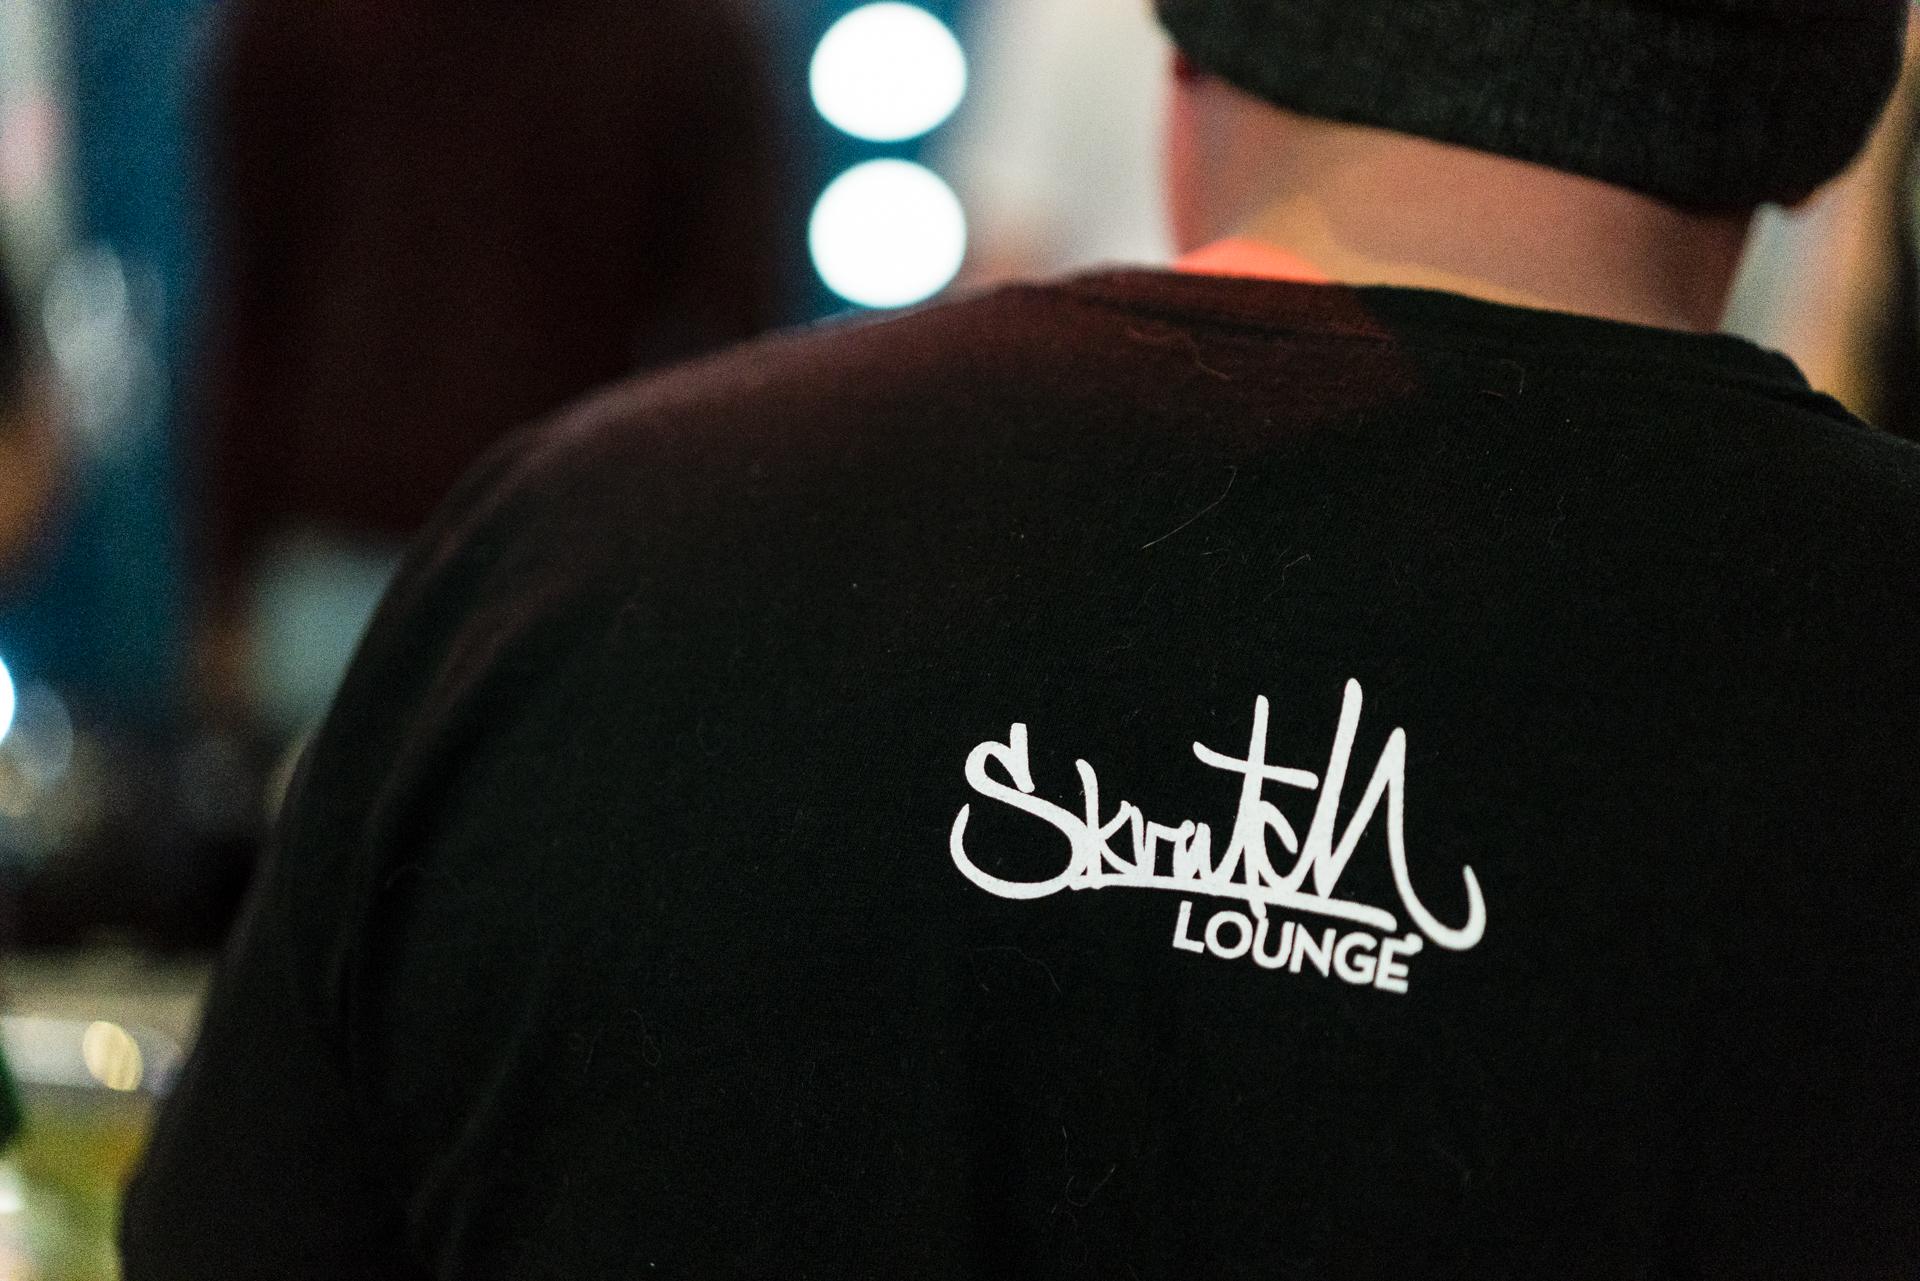 2017_03_02_Skratch Lounge_0022_Export.jpg